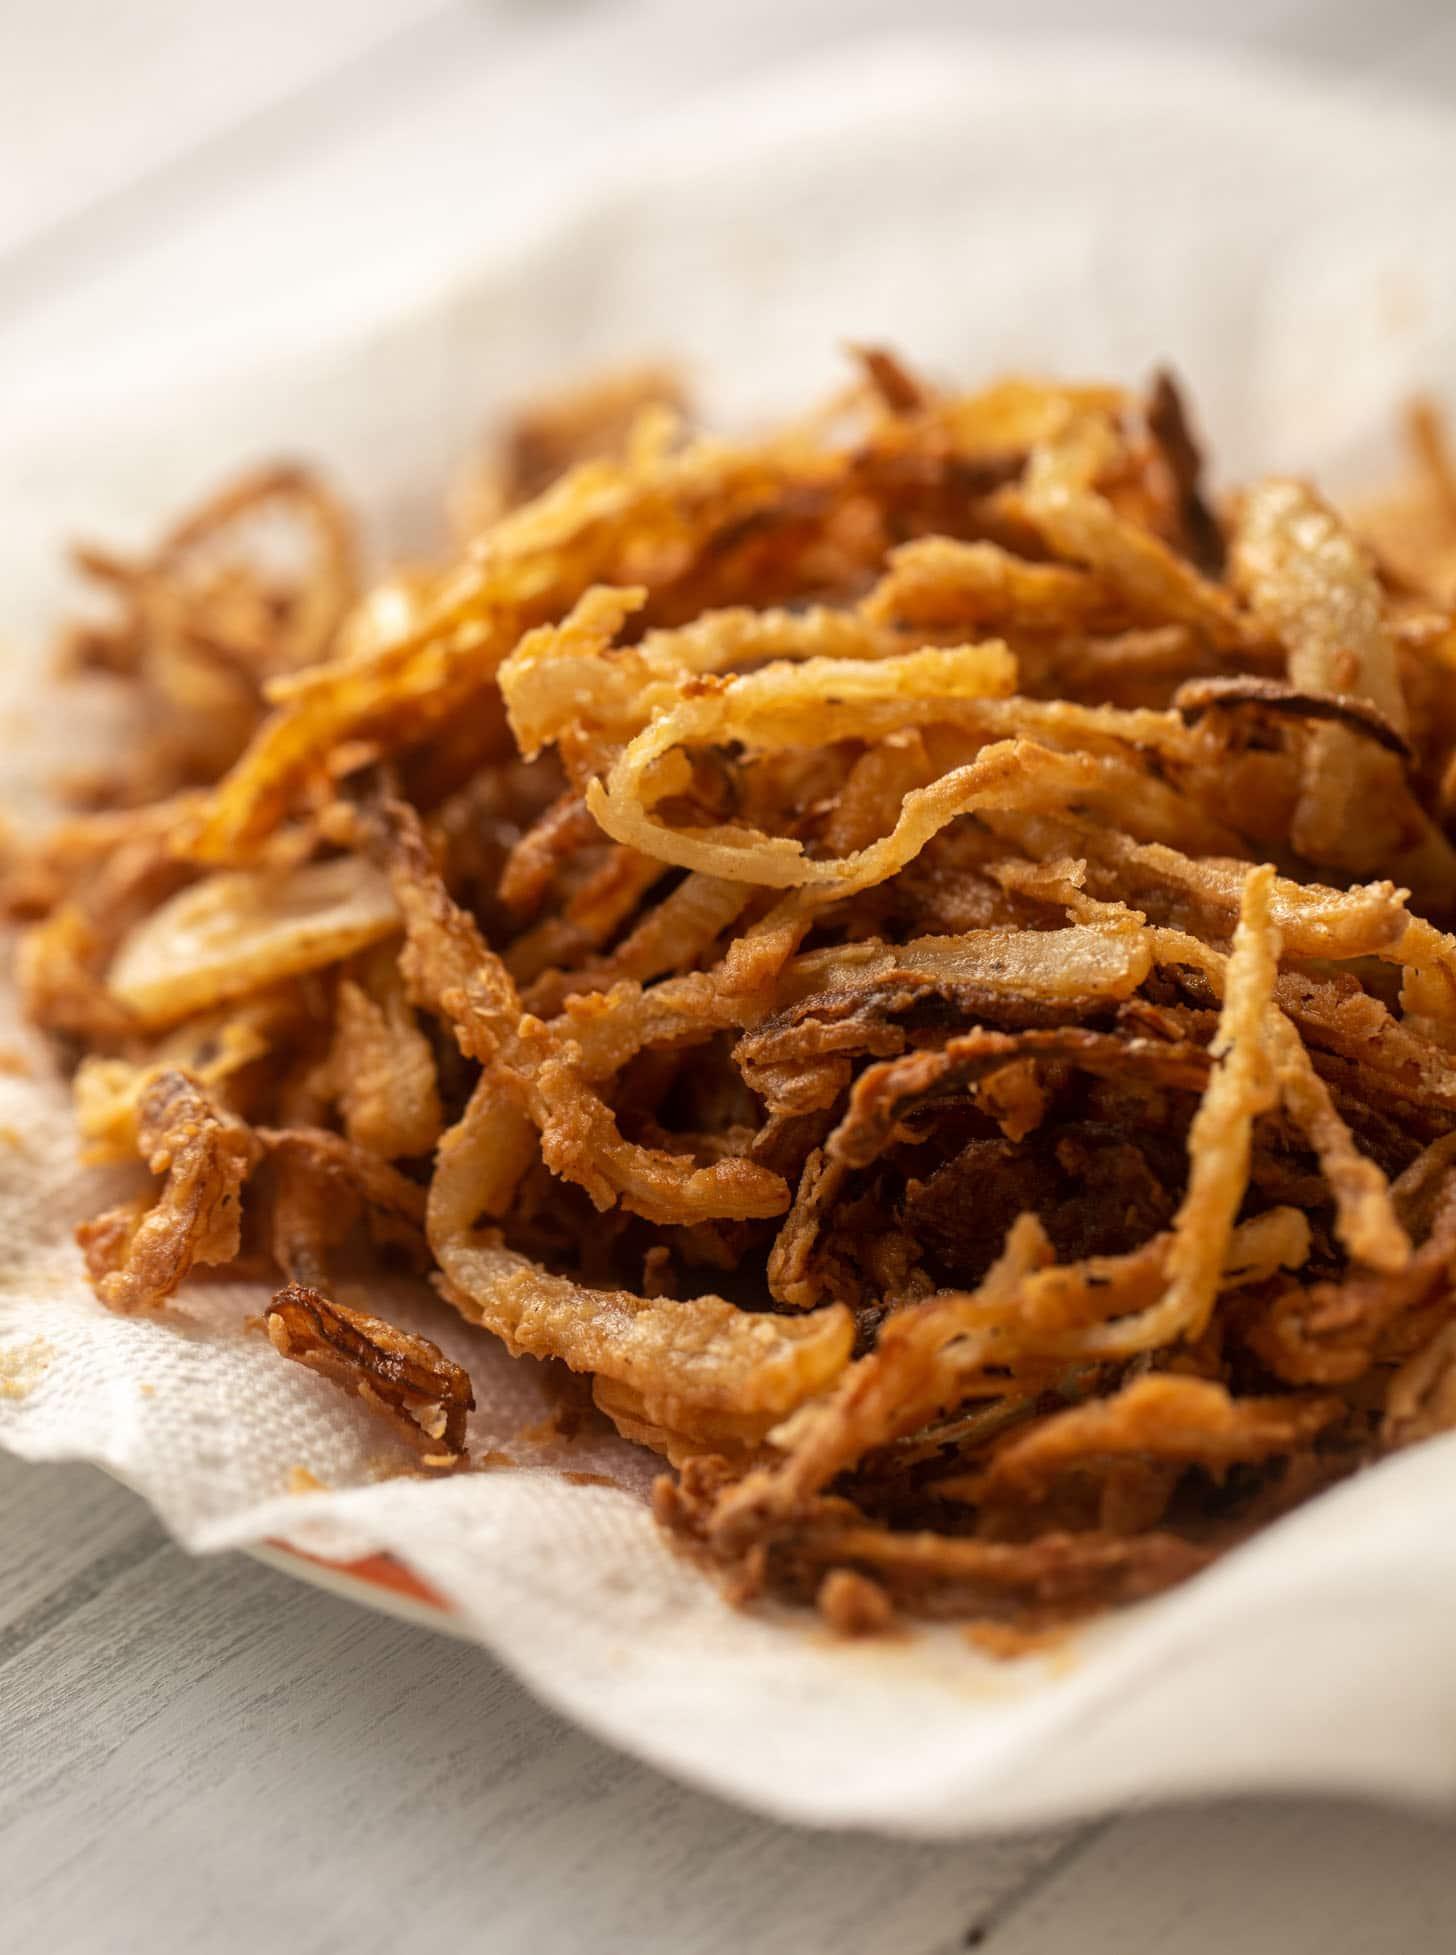 crispy french fried onions